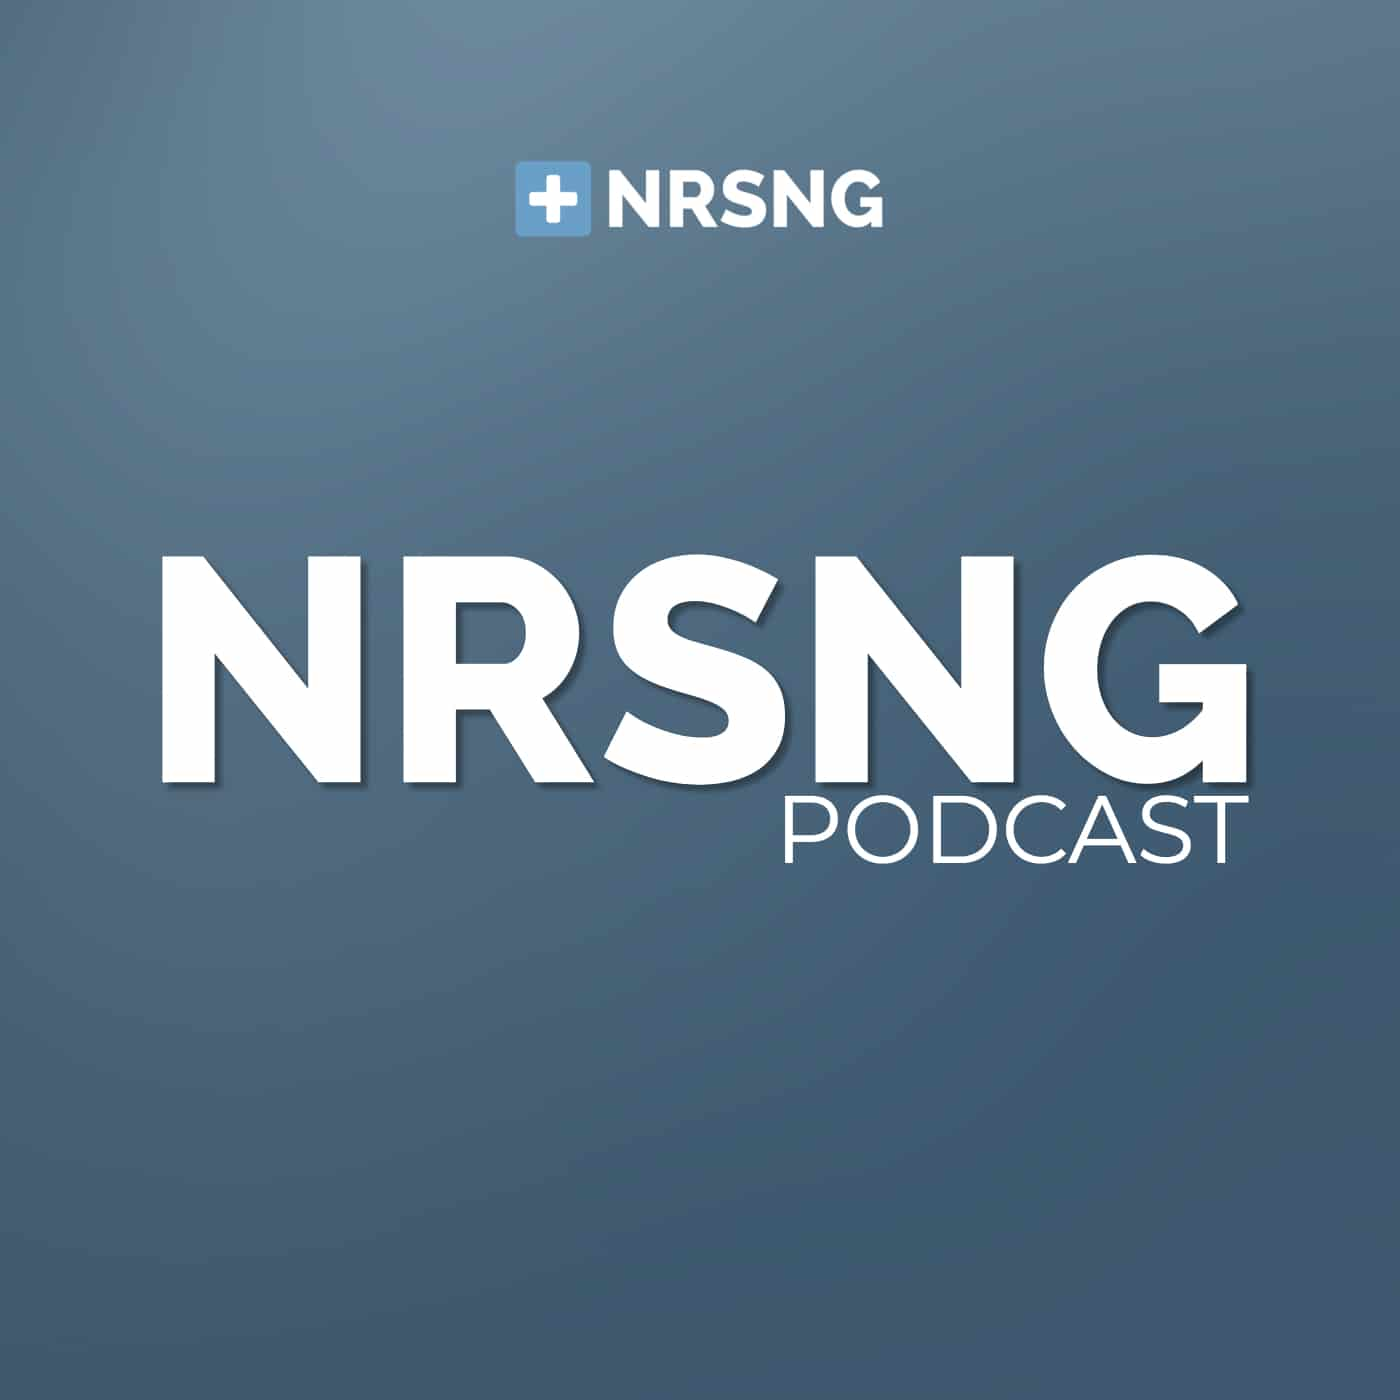 NRSNG Podcast